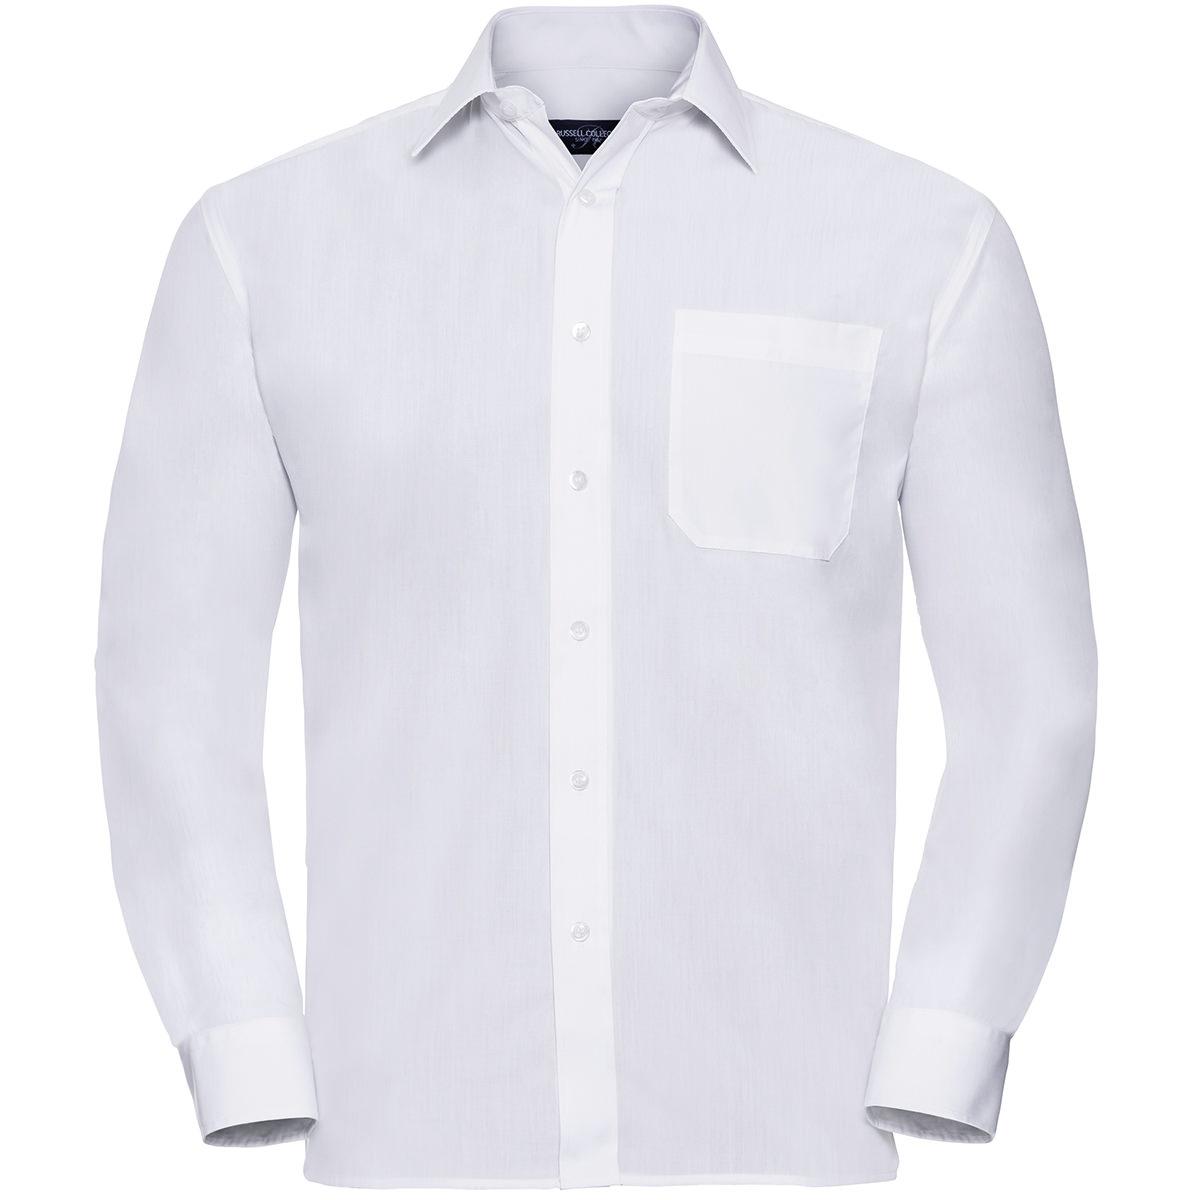 Klassisches Baumwollmischgewebe Popeline Hemd - Langarm